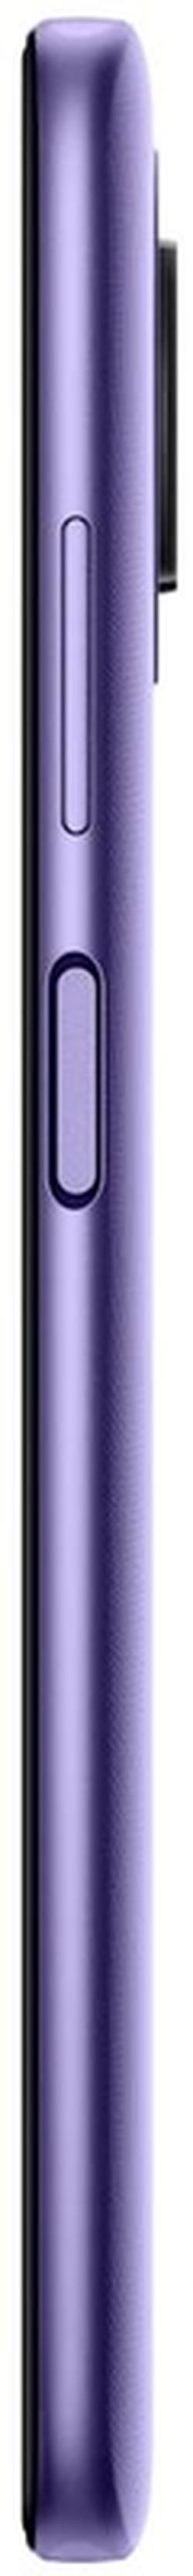 Мобильный телефон Xiaomi Redmi Note 9T 4Gb/128Gb Purple